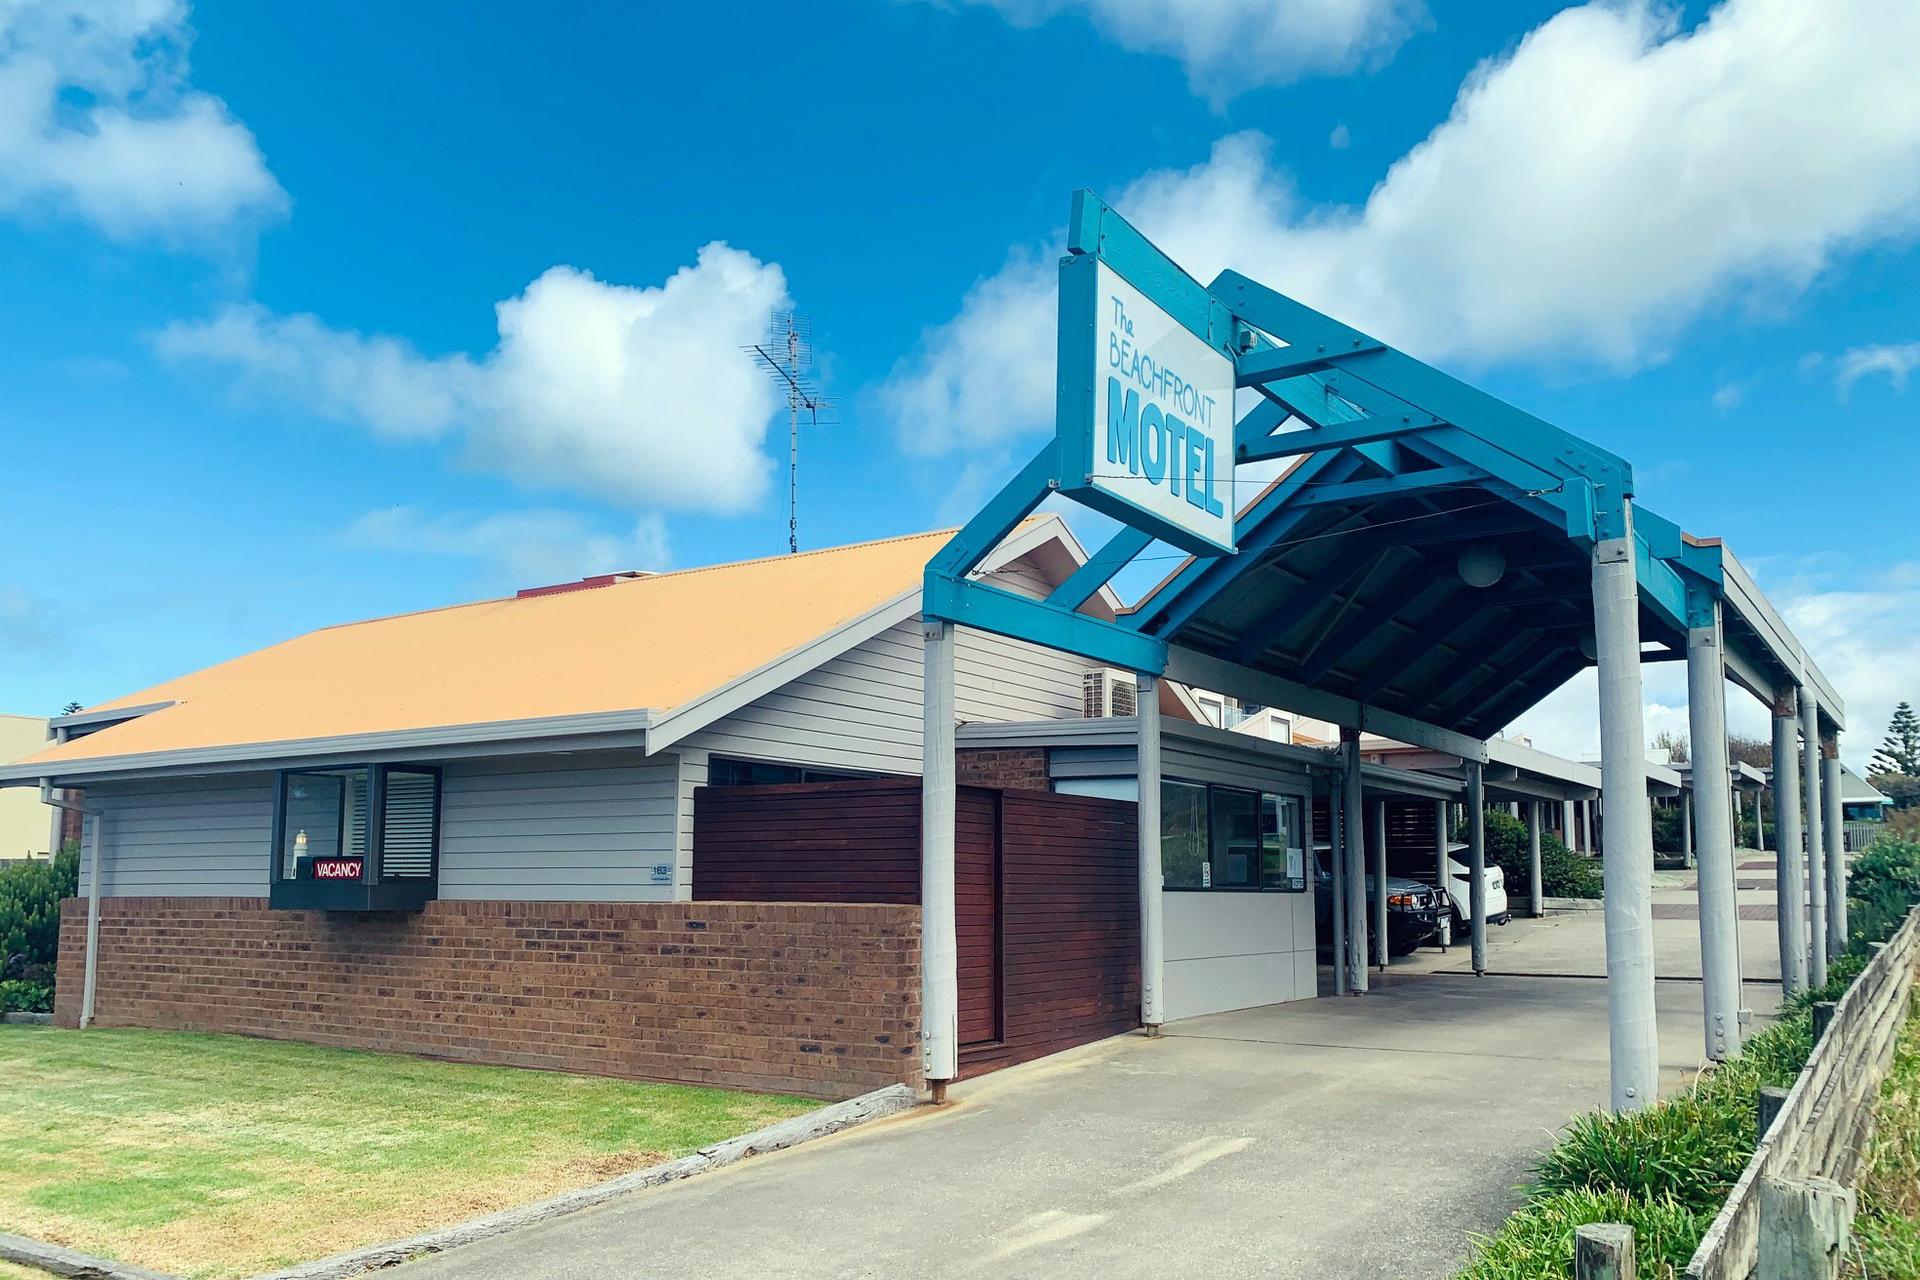 o - The Beachfront Motel